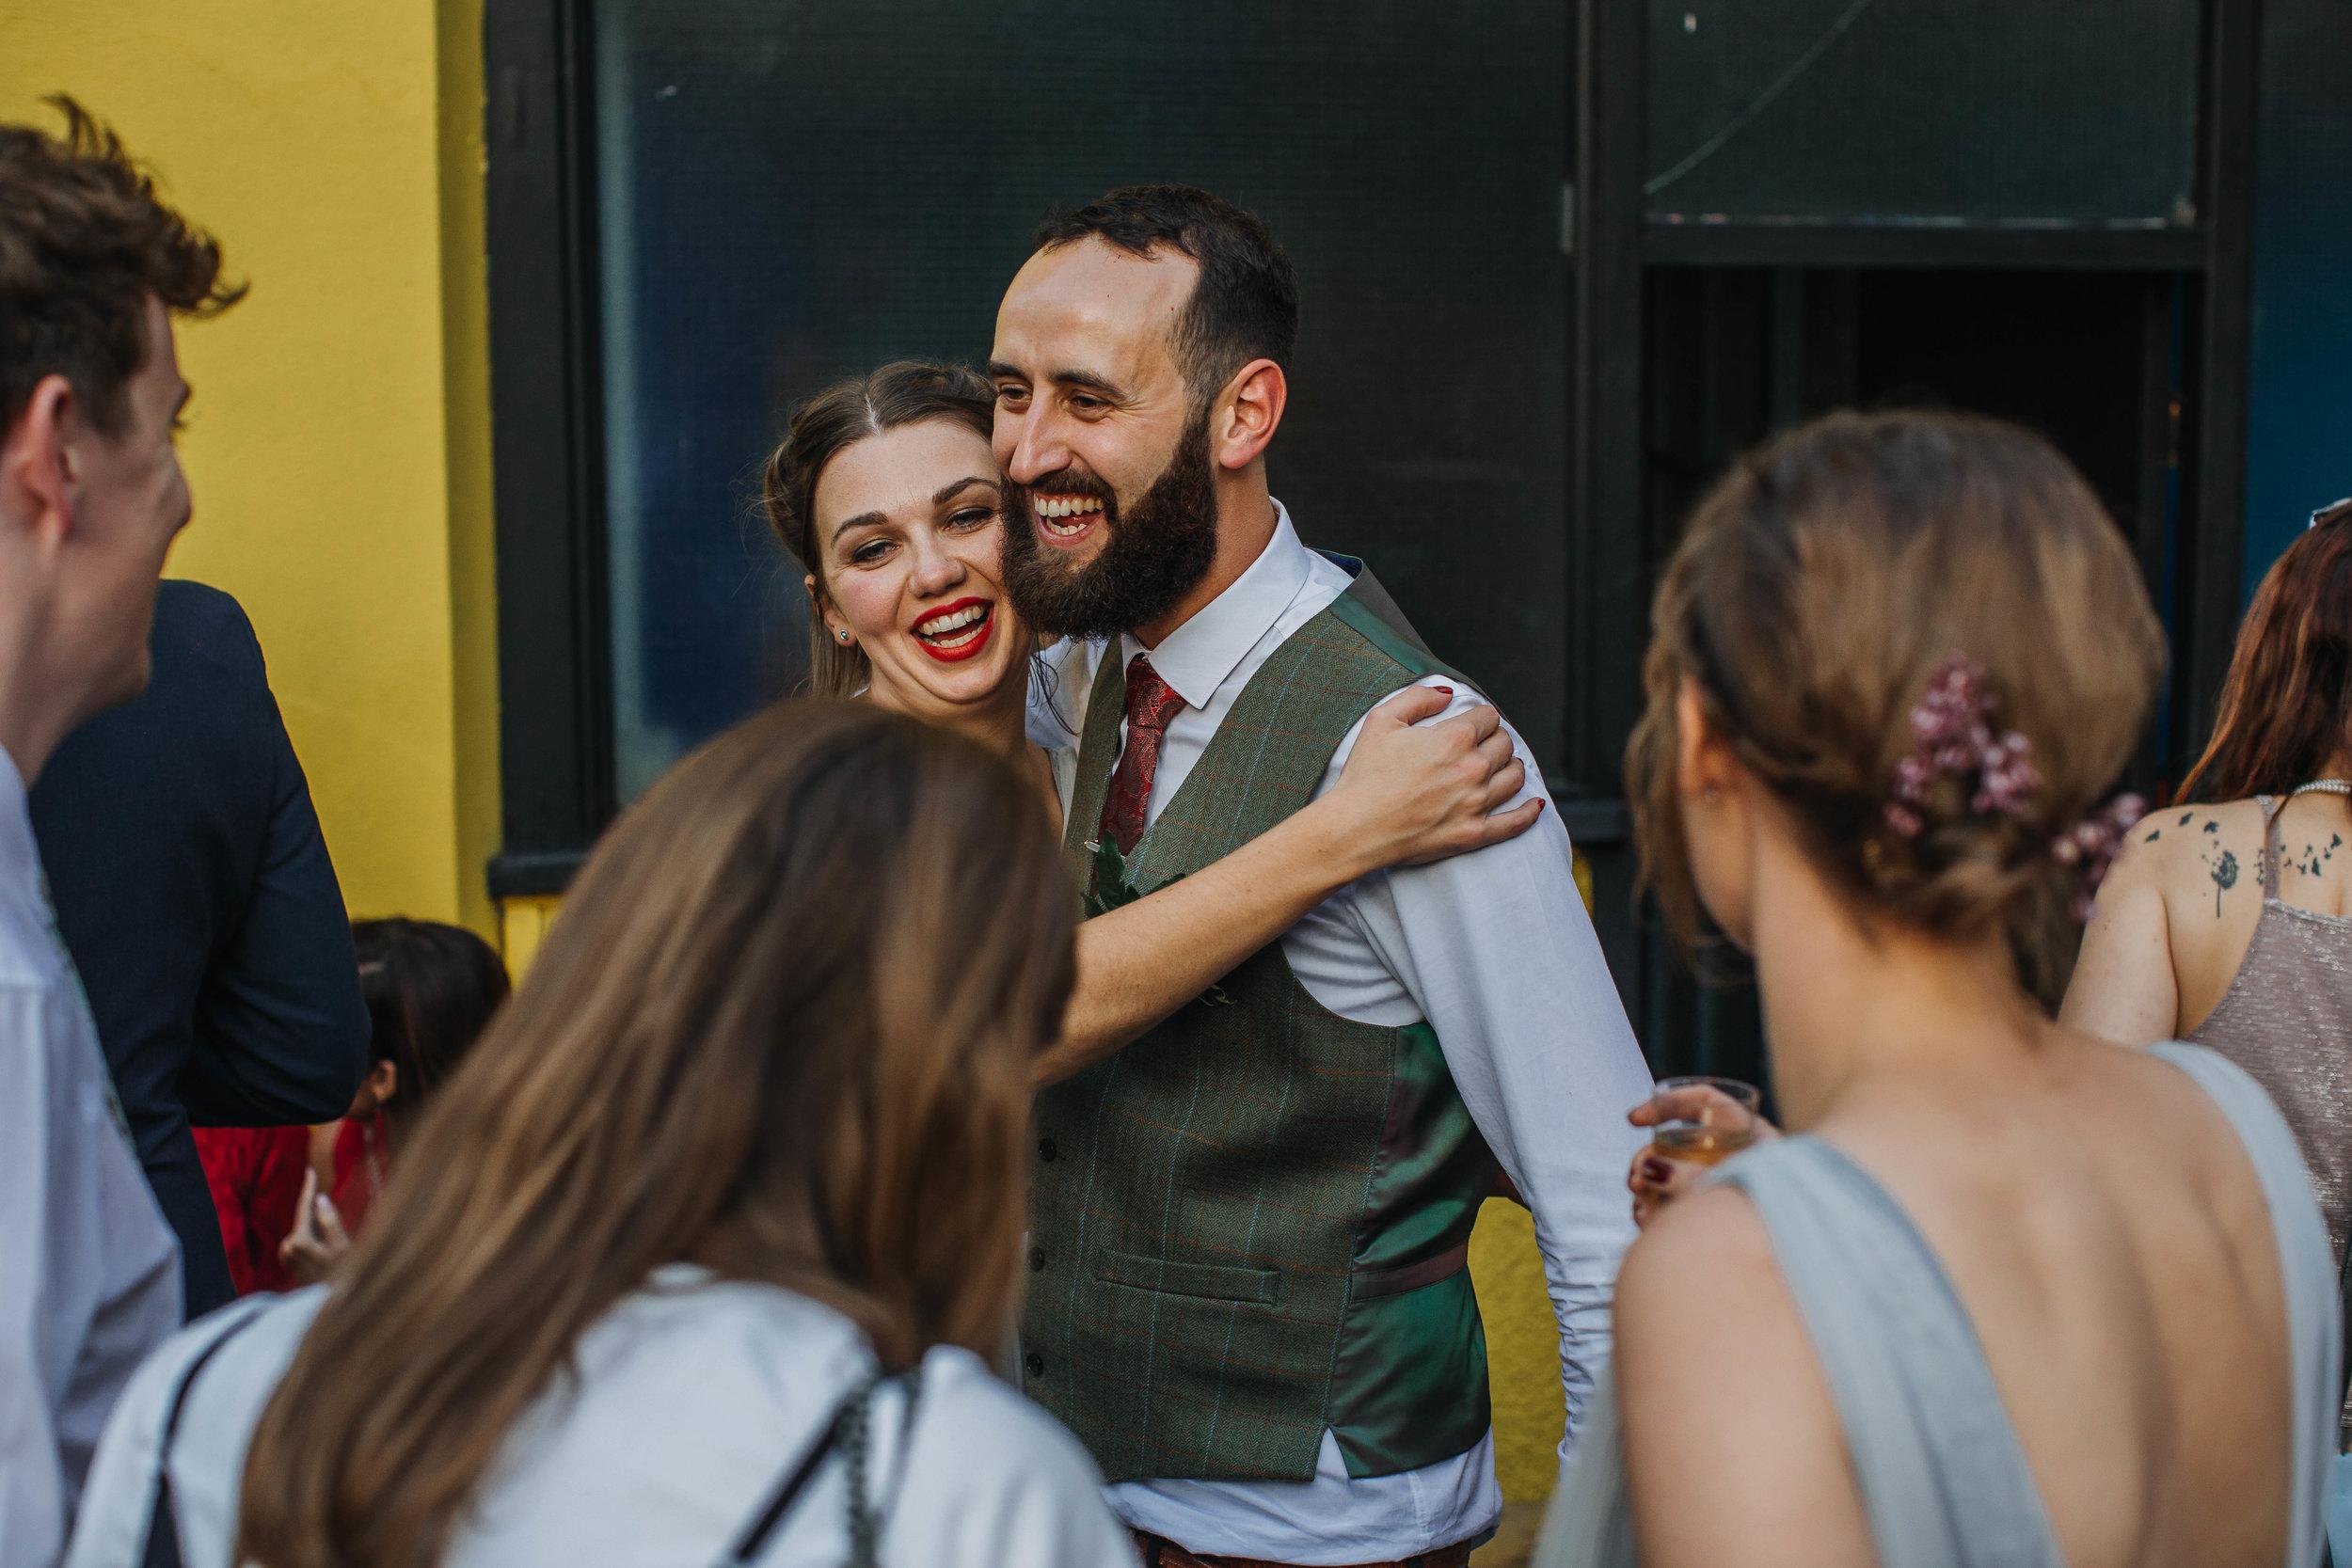 Urban Wedding at The Hide, Sheffield